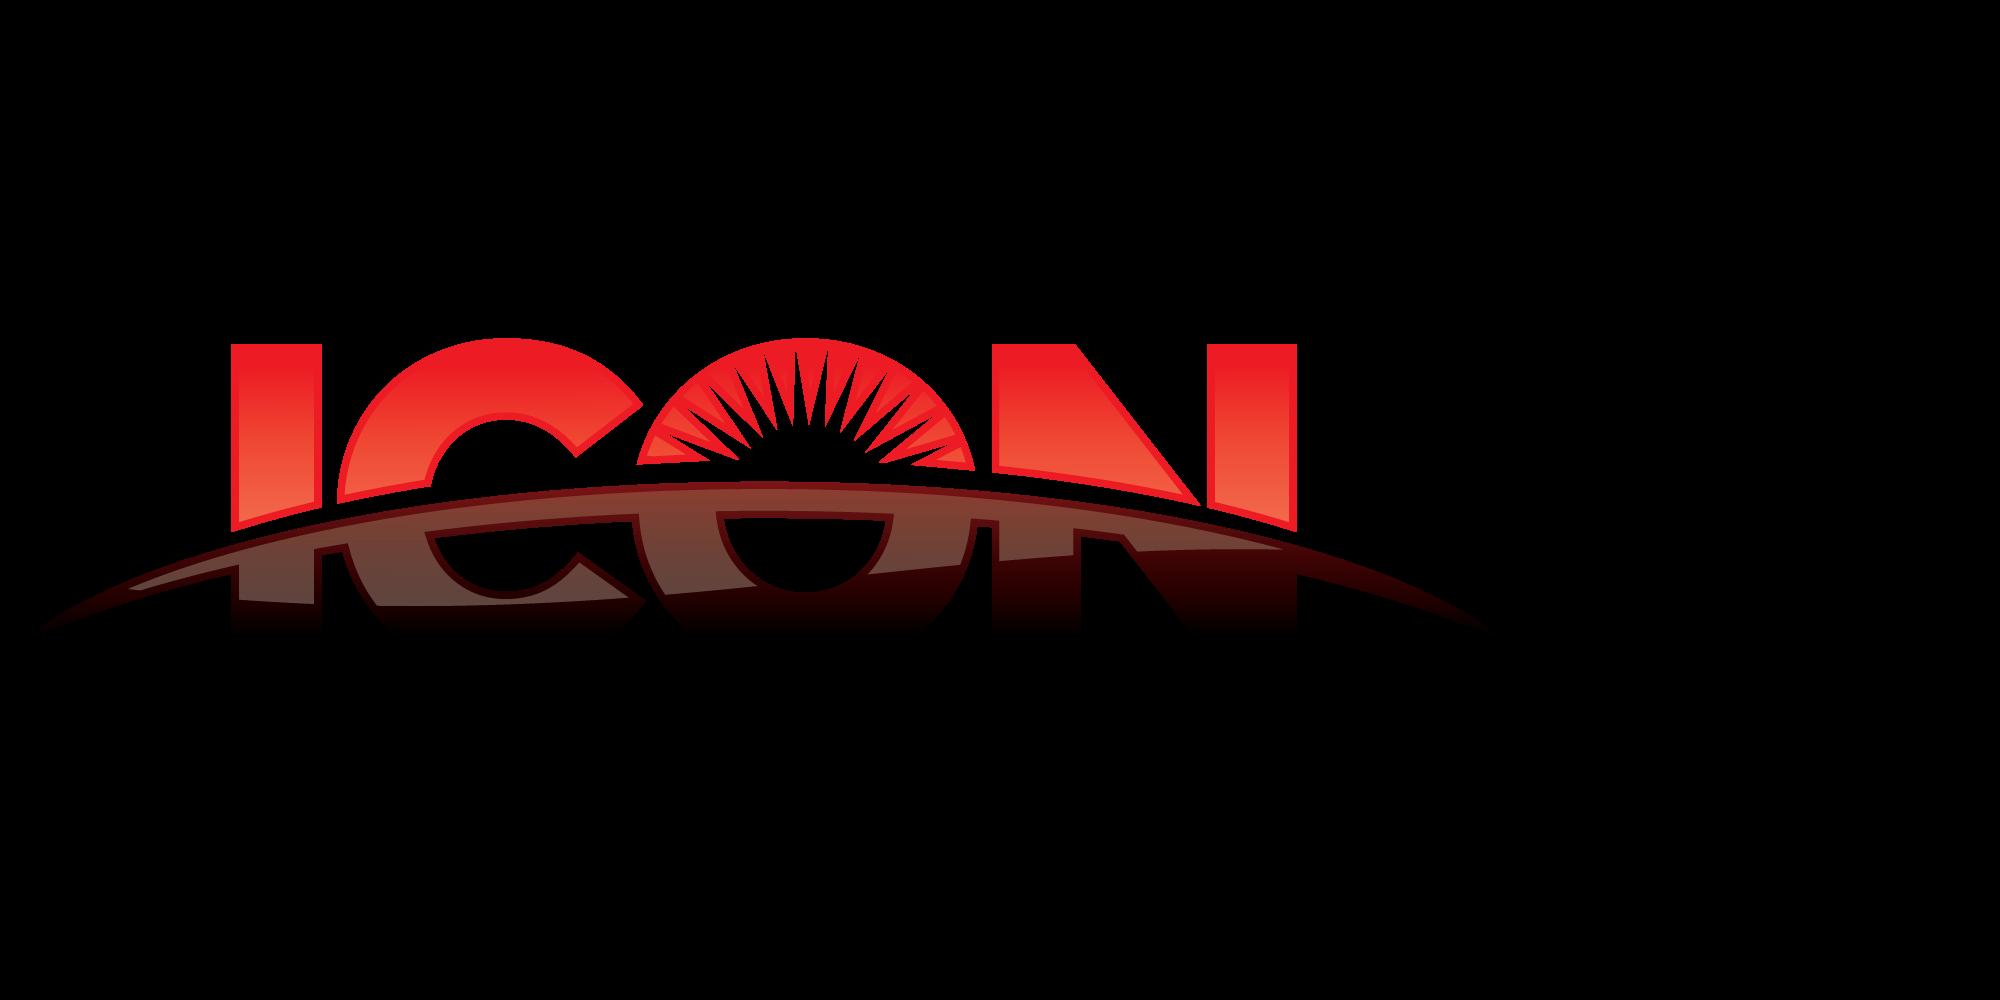 IconDirect.com